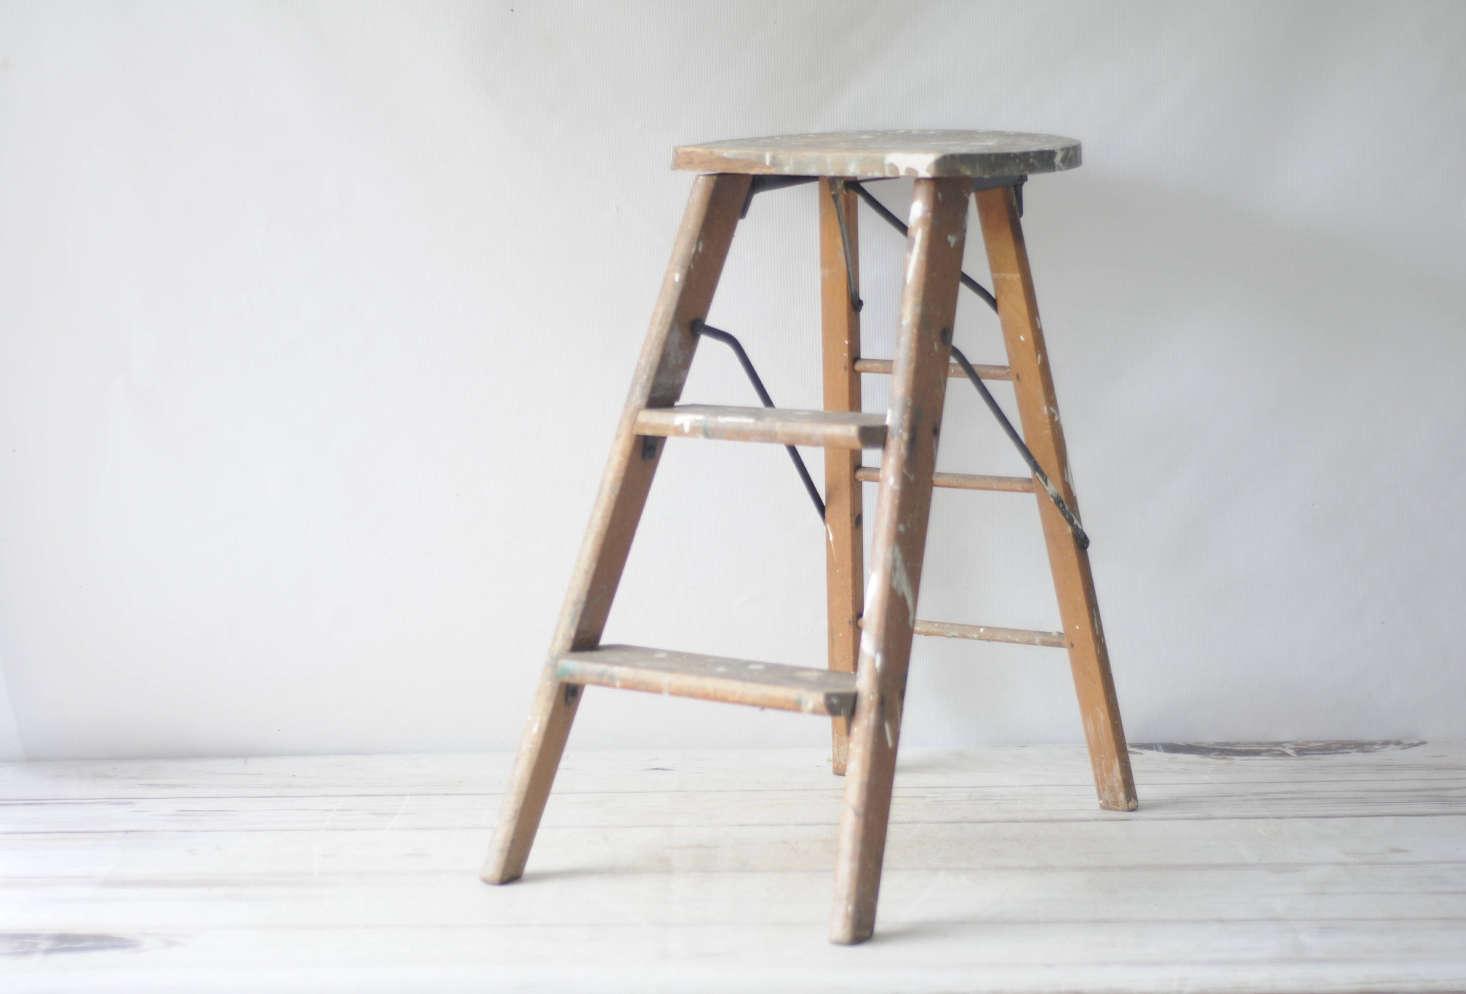 Etsy Storage Folding Ladders Paint Splatters Included